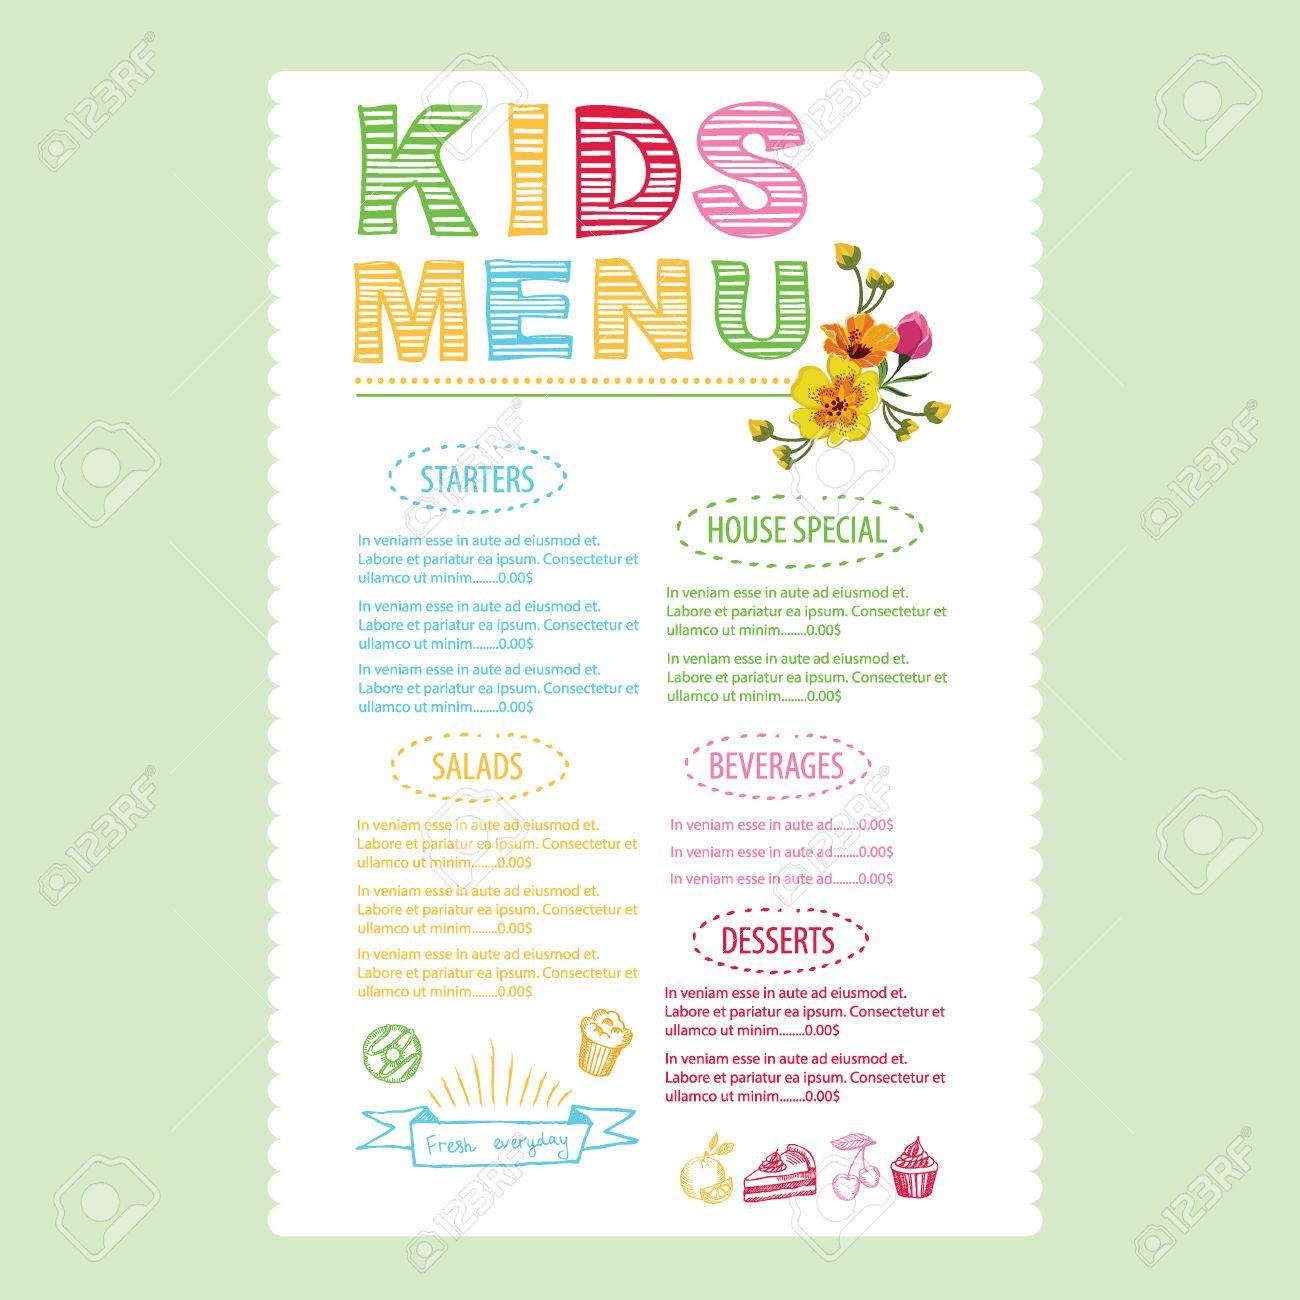 kids menu template 25 free psd eps documents download free cute – Free Kids Menu Templates